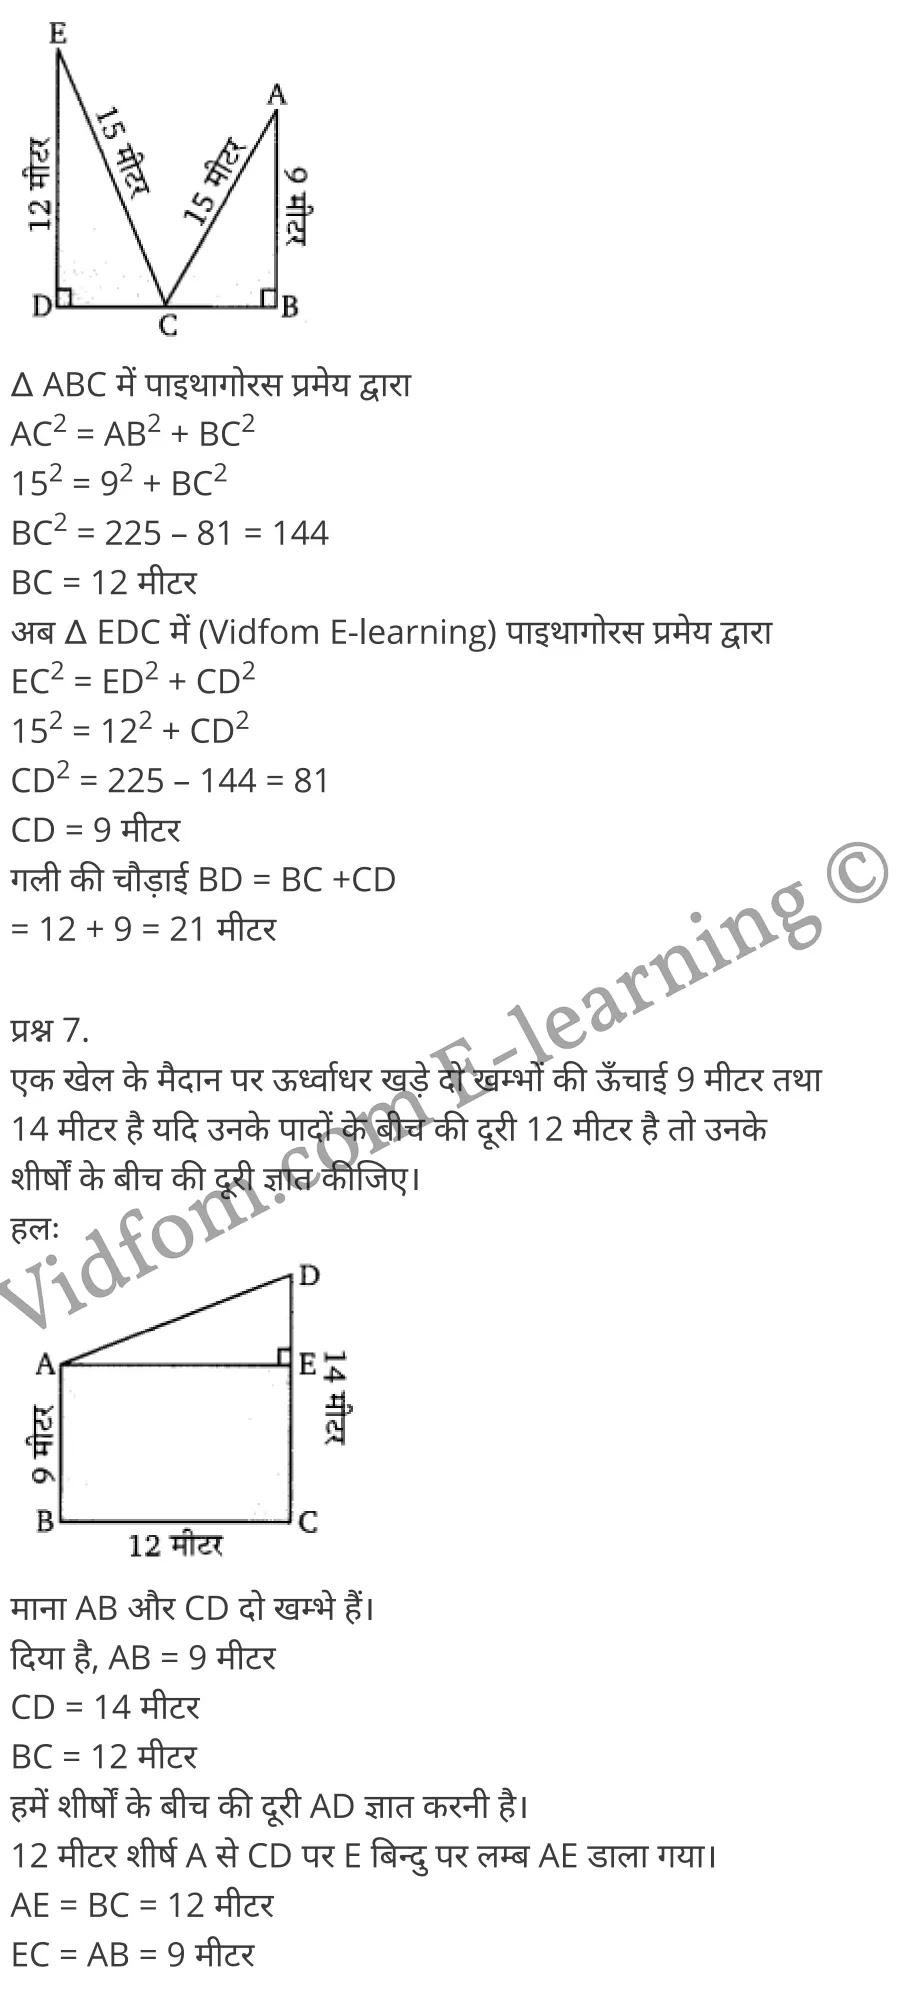 Chapter 7 Triangles Ex 7.1 Chapter 7 Triangles Ex 7.2 Chapter 7 Triangles Ex 7.3 Chapter 7 Triangles Ex 7.4 कक्षा 10 बालाजी गणित  के नोट्स  हिंदी में एनसीईआरटी समाधान,     class 10 Balaji Maths Chapter 7,   class 10 Balaji Maths Chapter 7 ncert solutions in Hindi,   class 10 Balaji Maths Chapter 7 notes in hindi,   class 10 Balaji Maths Chapter 7 question answer,   class 10 Balaji Maths Chapter 7 notes,   class 10 Balaji Maths Chapter 7 class 10 Balaji Maths Chapter 7 in  hindi,    class 10 Balaji Maths Chapter 7 important questions in  hindi,   class 10 Balaji Maths Chapter 7 notes in hindi,    class 10 Balaji Maths Chapter 7 test,   class 10 Balaji Maths Chapter 7 pdf,   class 10 Balaji Maths Chapter 7 notes pdf,   class 10 Balaji Maths Chapter 7 exercise solutions,   class 10 Balaji Maths Chapter 7 notes study rankers,   class 10 Balaji Maths Chapter 7 notes,    class 10 Balaji Maths Chapter 7  class 10  notes pdf,   class 10 Balaji Maths Chapter 7 class 10  notes  ncert,   class 10 Balaji Maths Chapter 7 class 10 pdf,   class 10 Balaji Maths Chapter 7  book,   class 10 Balaji Maths Chapter 7 quiz class 10  ,    10  th class 10 Balaji Maths Chapter 7  book up board,   up board 10  th class 10 Balaji Maths Chapter 7 notes,  class 10 Balaji Maths,   class 10 Balaji Maths ncert solutions in Hindi,   class 10 Balaji Maths notes in hindi,   class 10 Balaji Maths question answer,   class 10 Balaji Maths notes,  class 10 Balaji Maths class 10 Balaji Maths Chapter 7 in  hindi,    class 10 Balaji Maths important questions in  hindi,   class 10 Balaji Maths notes in hindi,    class 10 Balaji Maths test,  class 10 Balaji Maths class 10 Balaji Maths Chapter 7 pdf,   class 10 Balaji Maths notes pdf,   class 10 Balaji Maths exercise solutions,   class 10 Balaji Maths,  class 10 Balaji Maths notes study rankers,   class 10 Balaji Maths notes,  class 10 Balaji Maths notes,   class 10 Balaji Maths  class 10  notes pdf,   class 10 Balaji Maths class 10  notes  ncert,   class 10 Ba